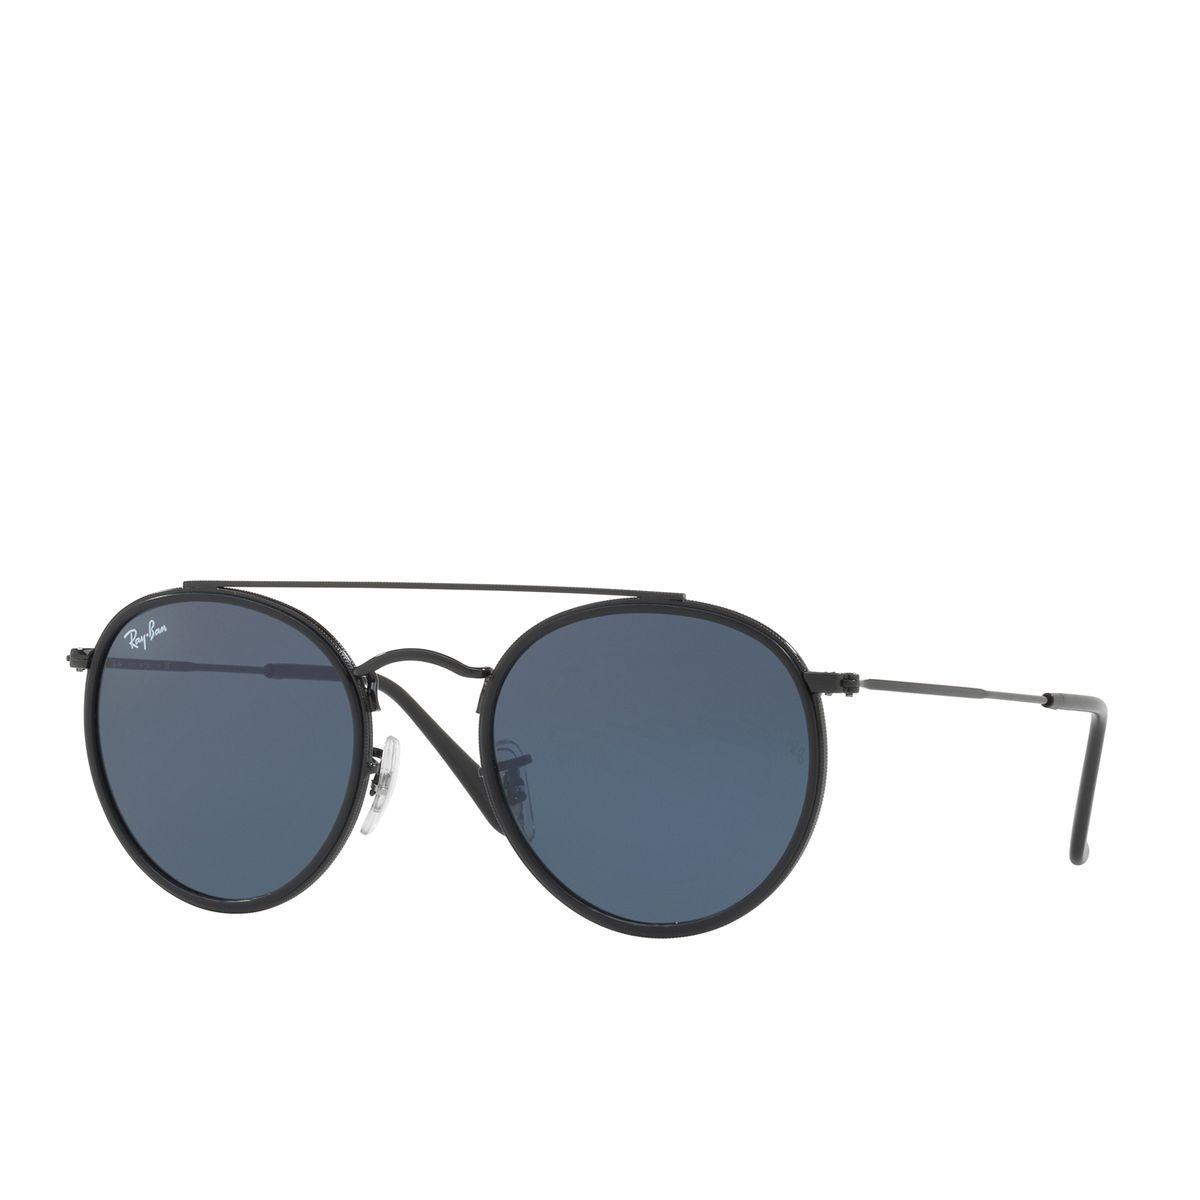 buy ray ban sunglasses cheap uk